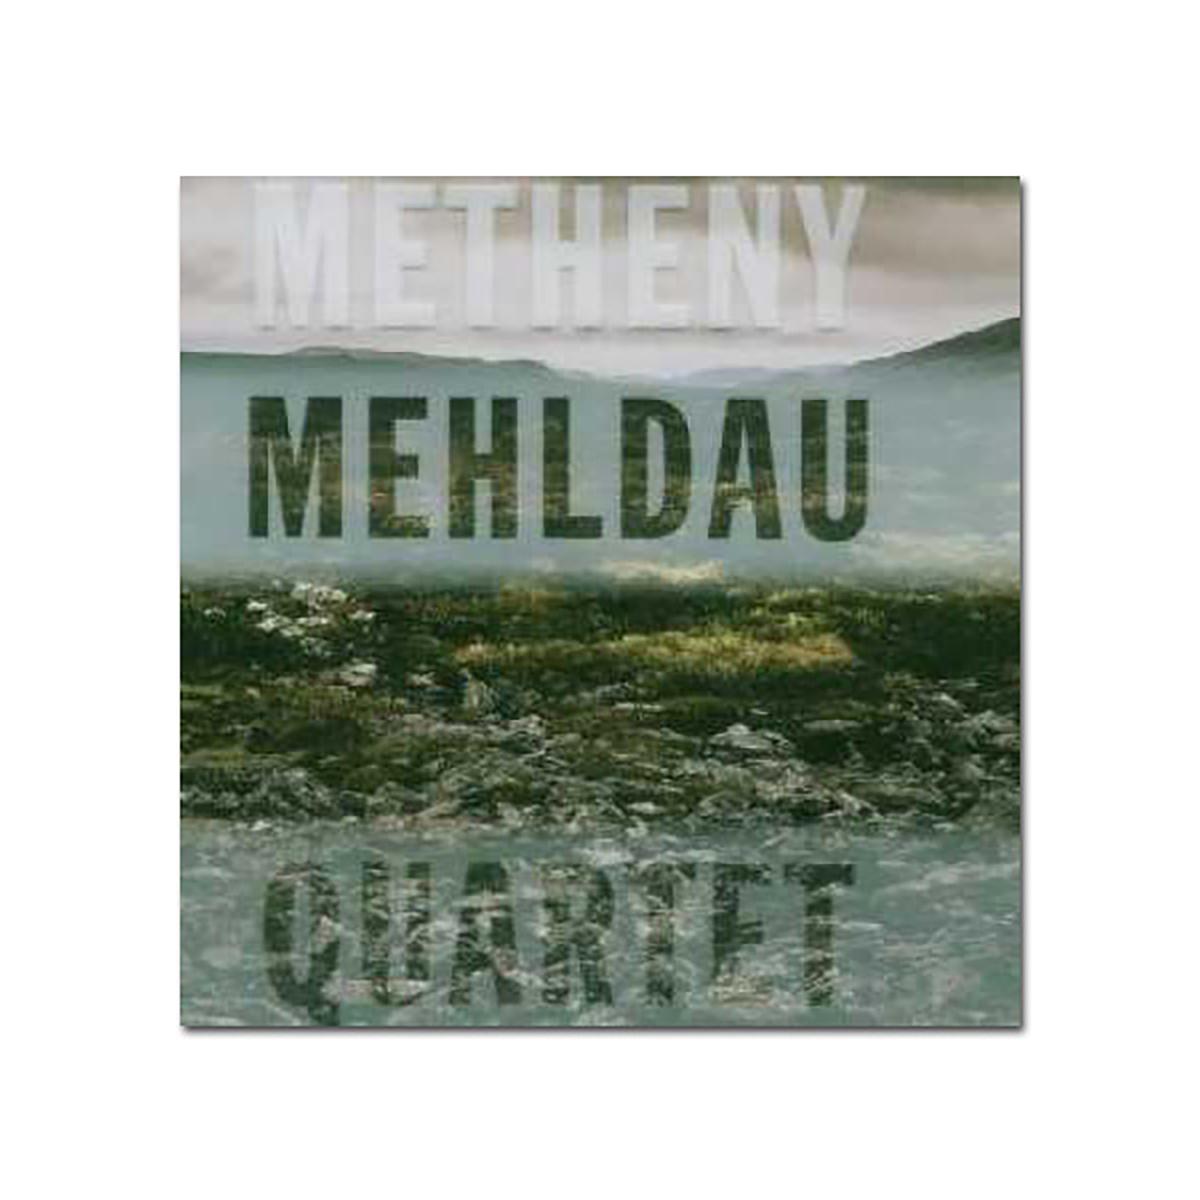 Metheny Mehldau Quartet. Metheny Mehldau Quartet - Digital Download. Item #: 4YDD18